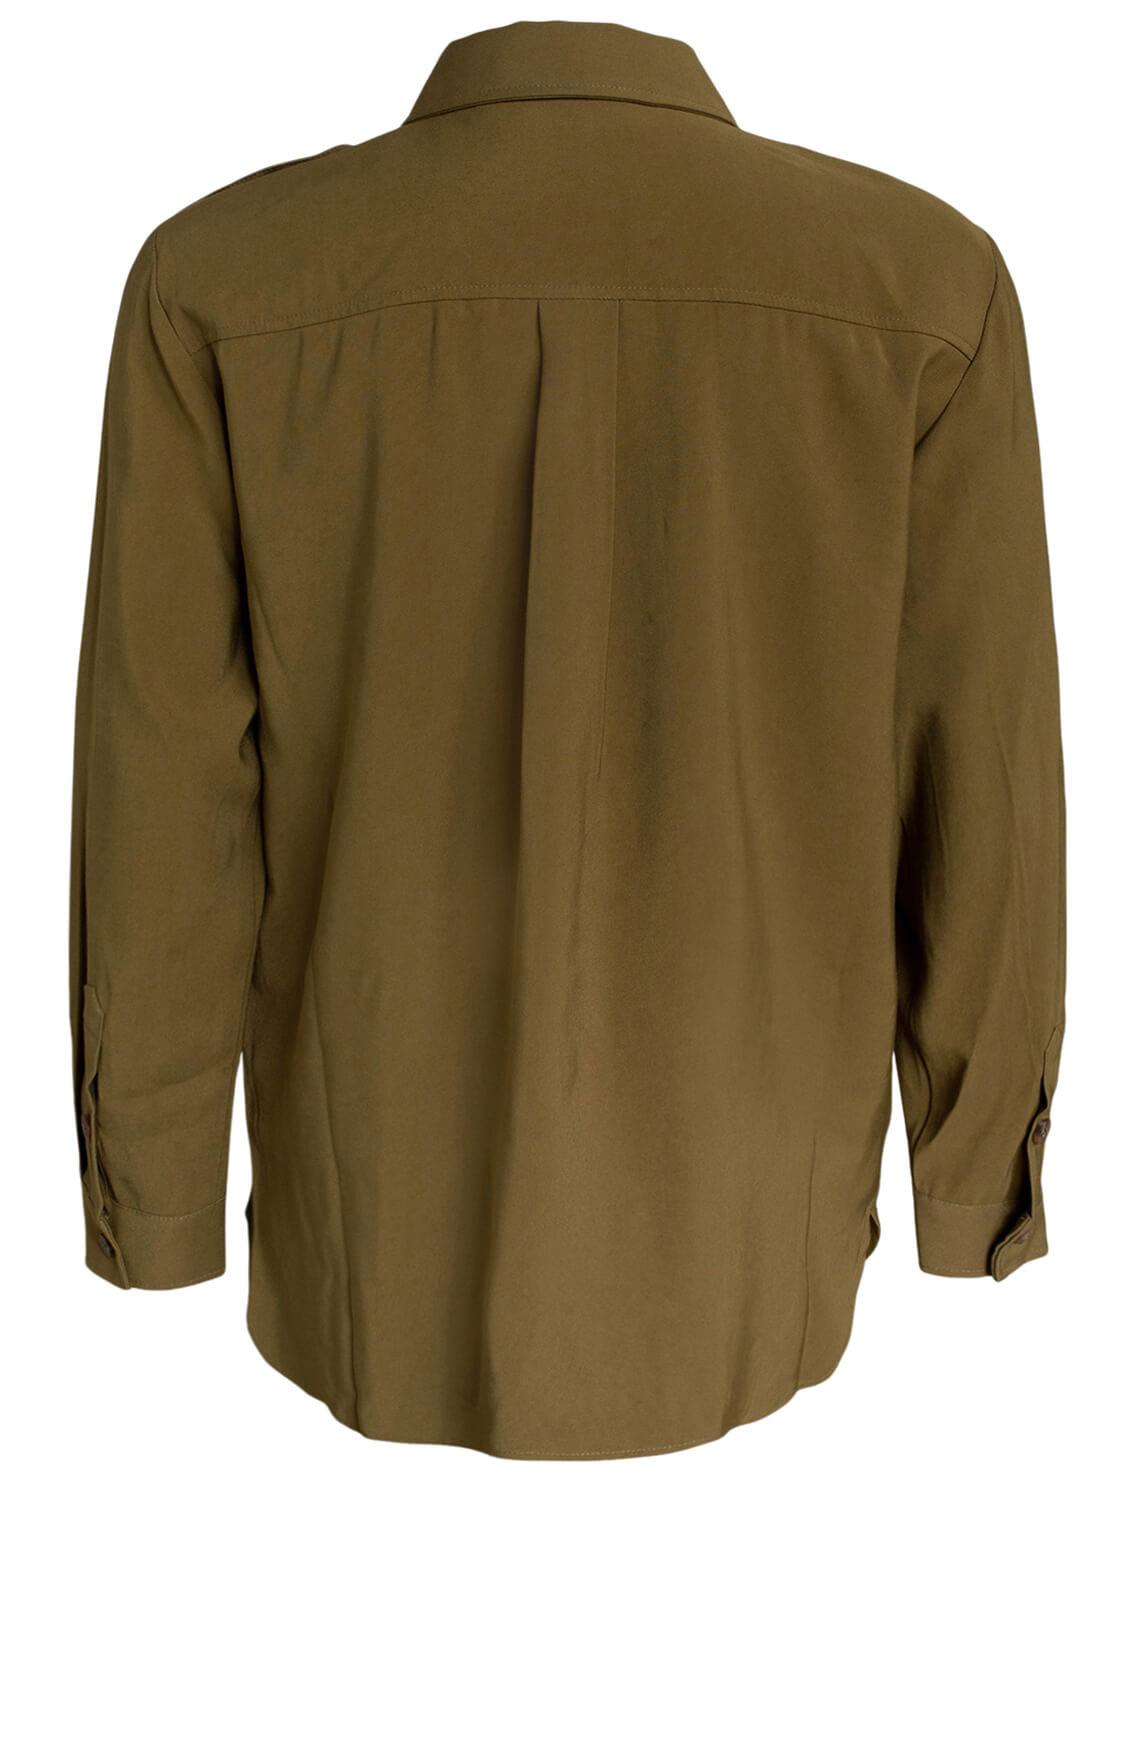 Copenhagen Muse Dames Cash blouse groen